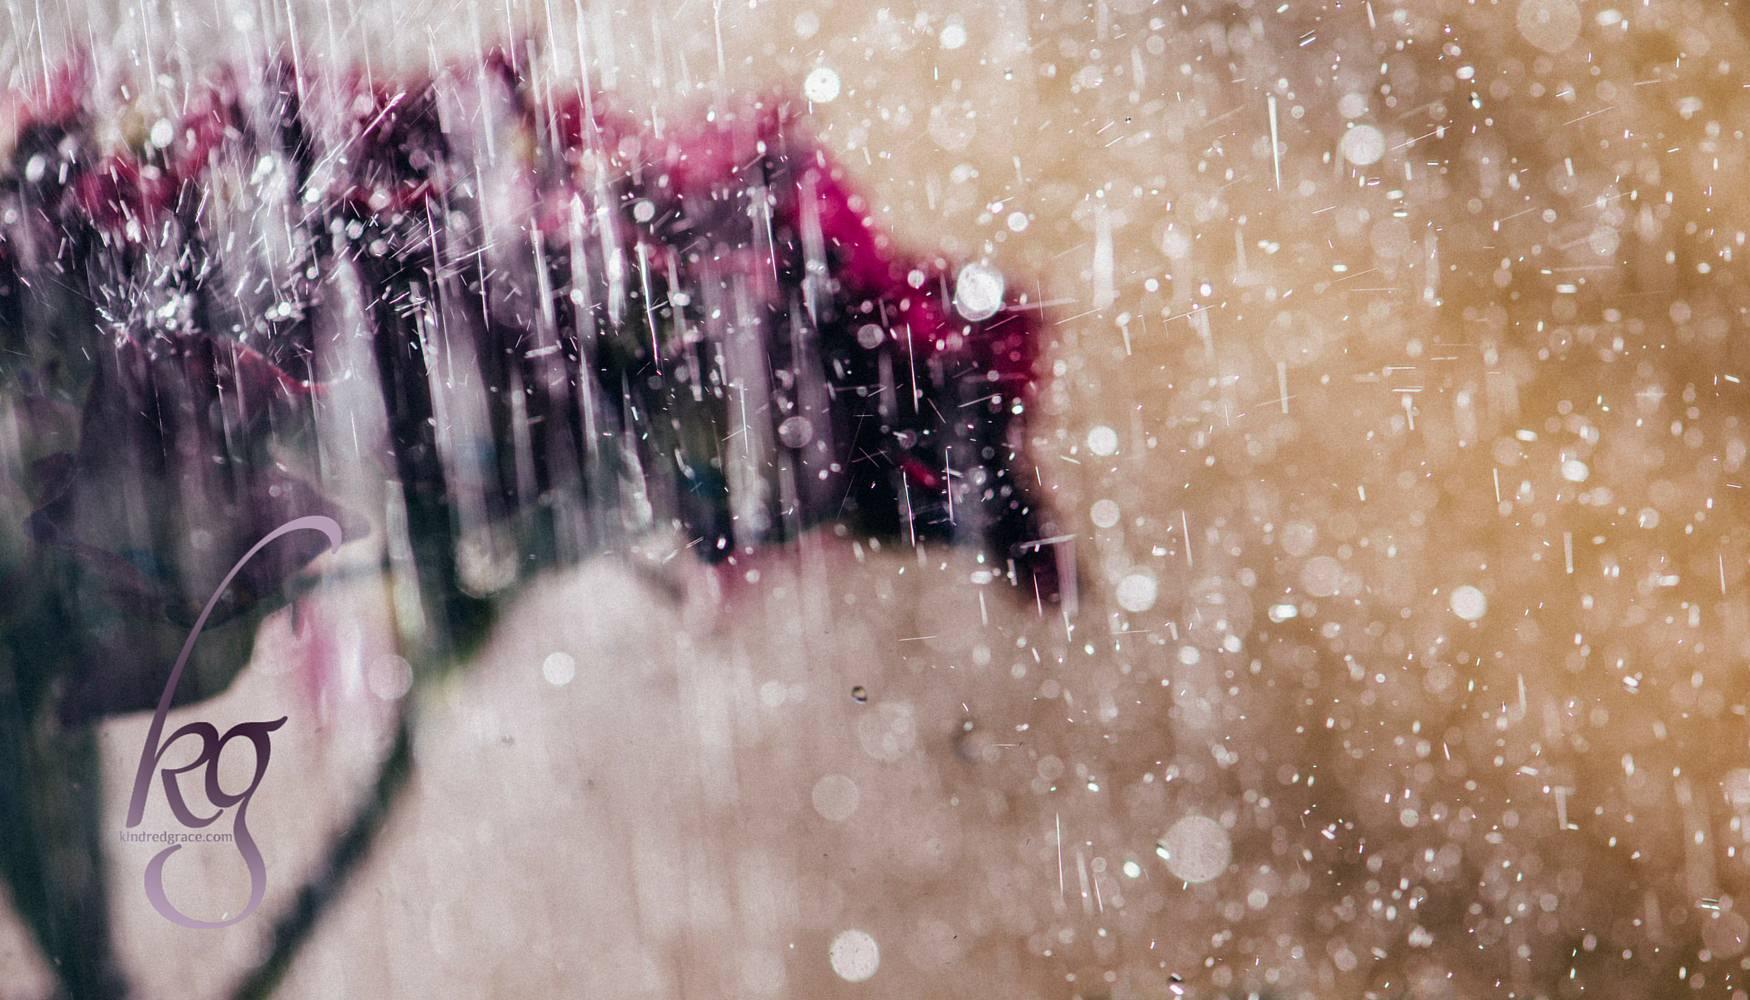 Choosing Joy in the Rain